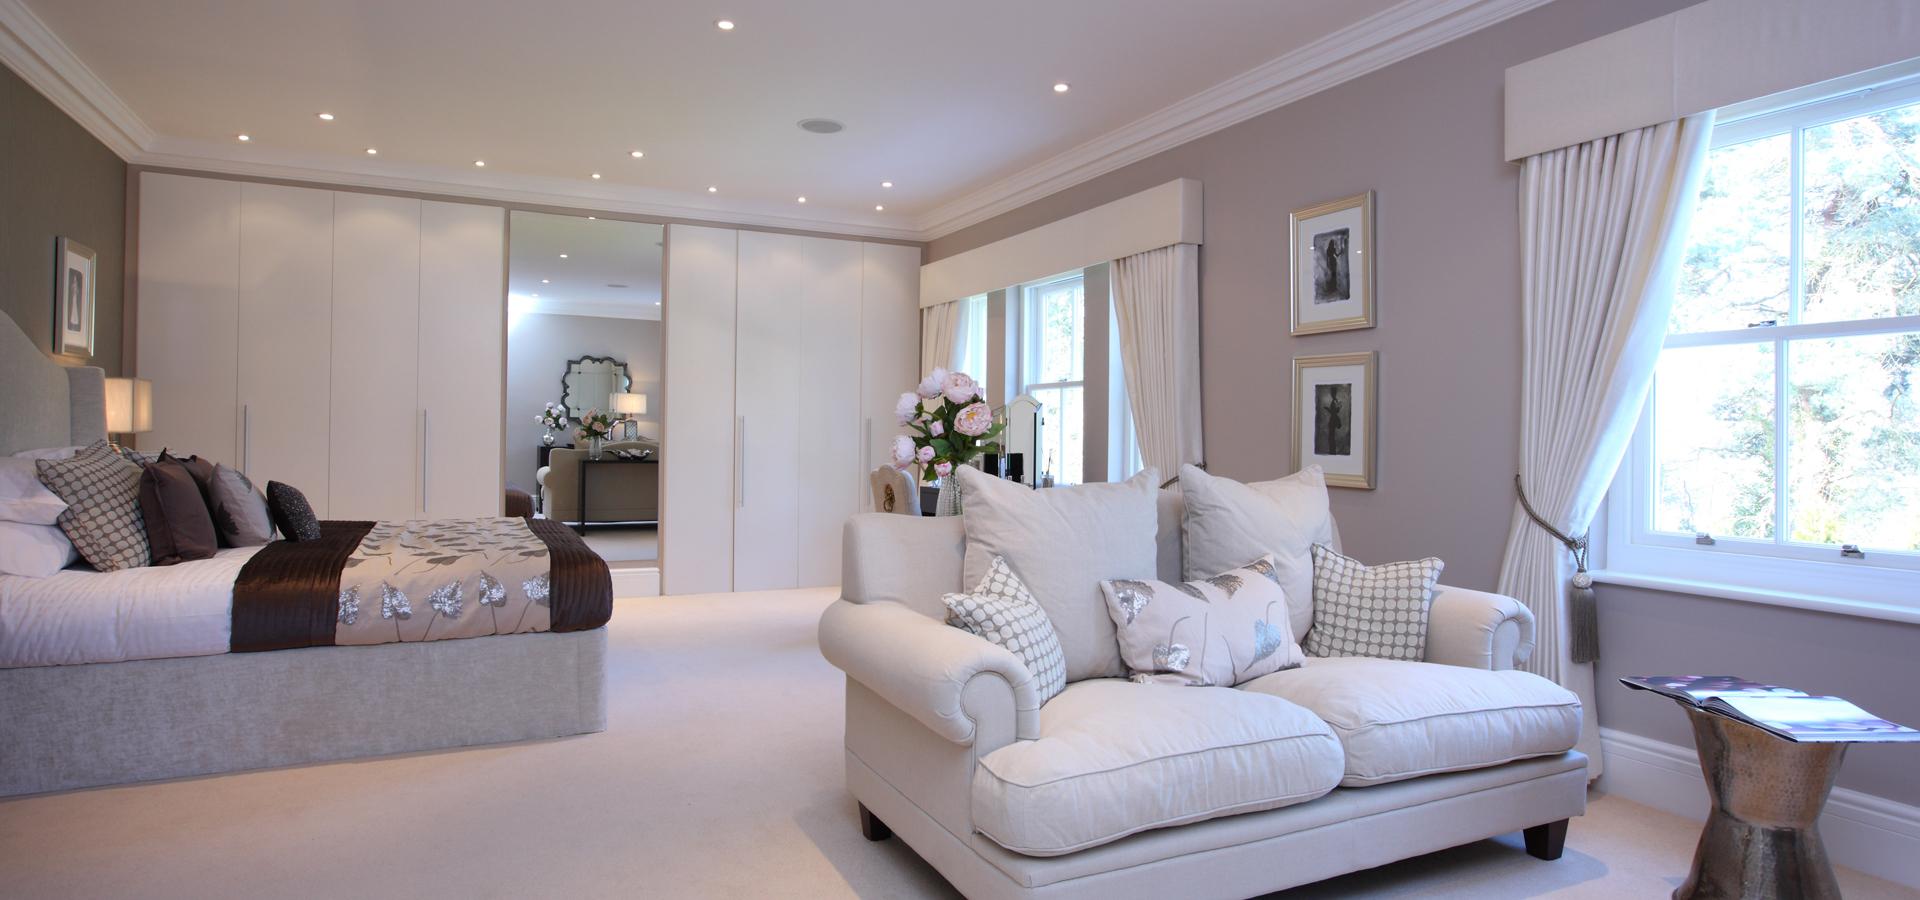 alfa - fitted bedroom furniture | wardrobes uk | lawrence walsh